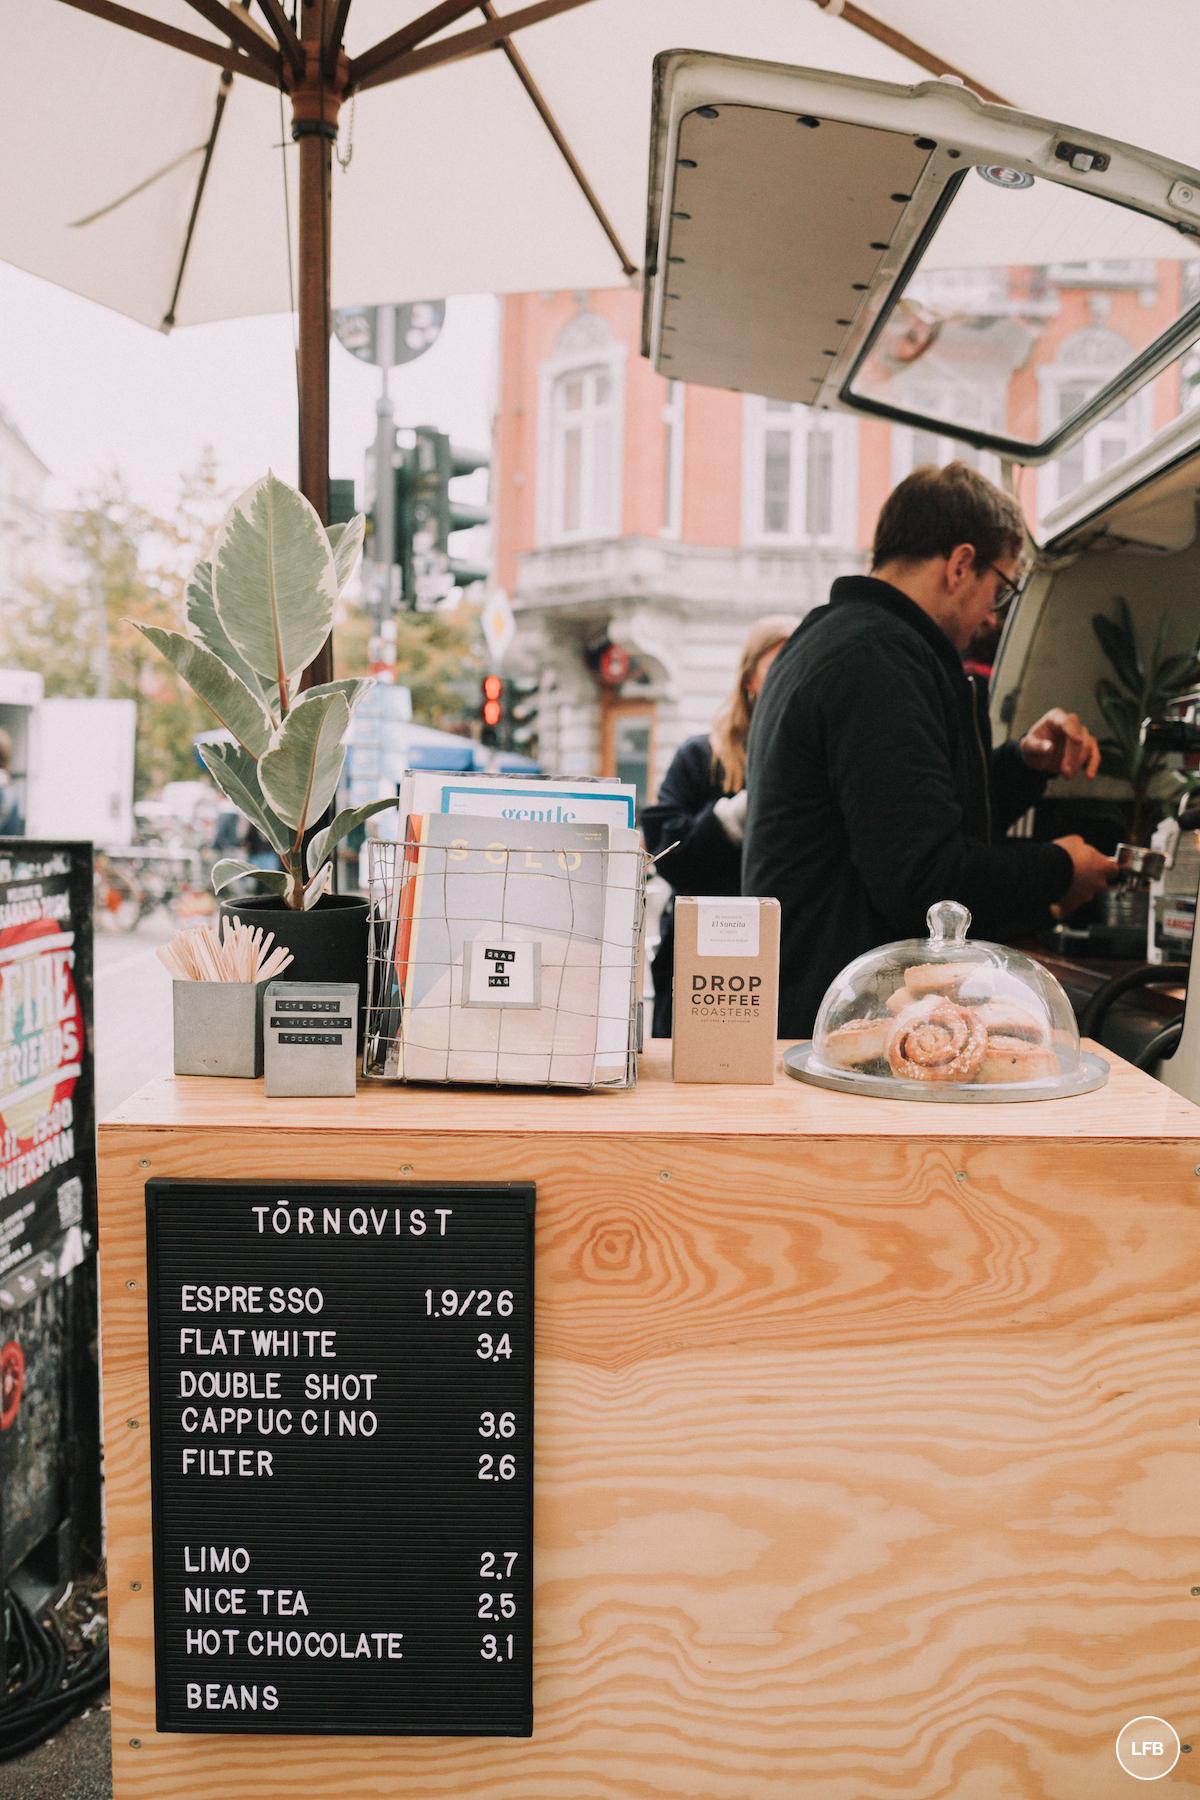 Hamburg Travel Photos - lovefromberlin.net - Rae Tashman